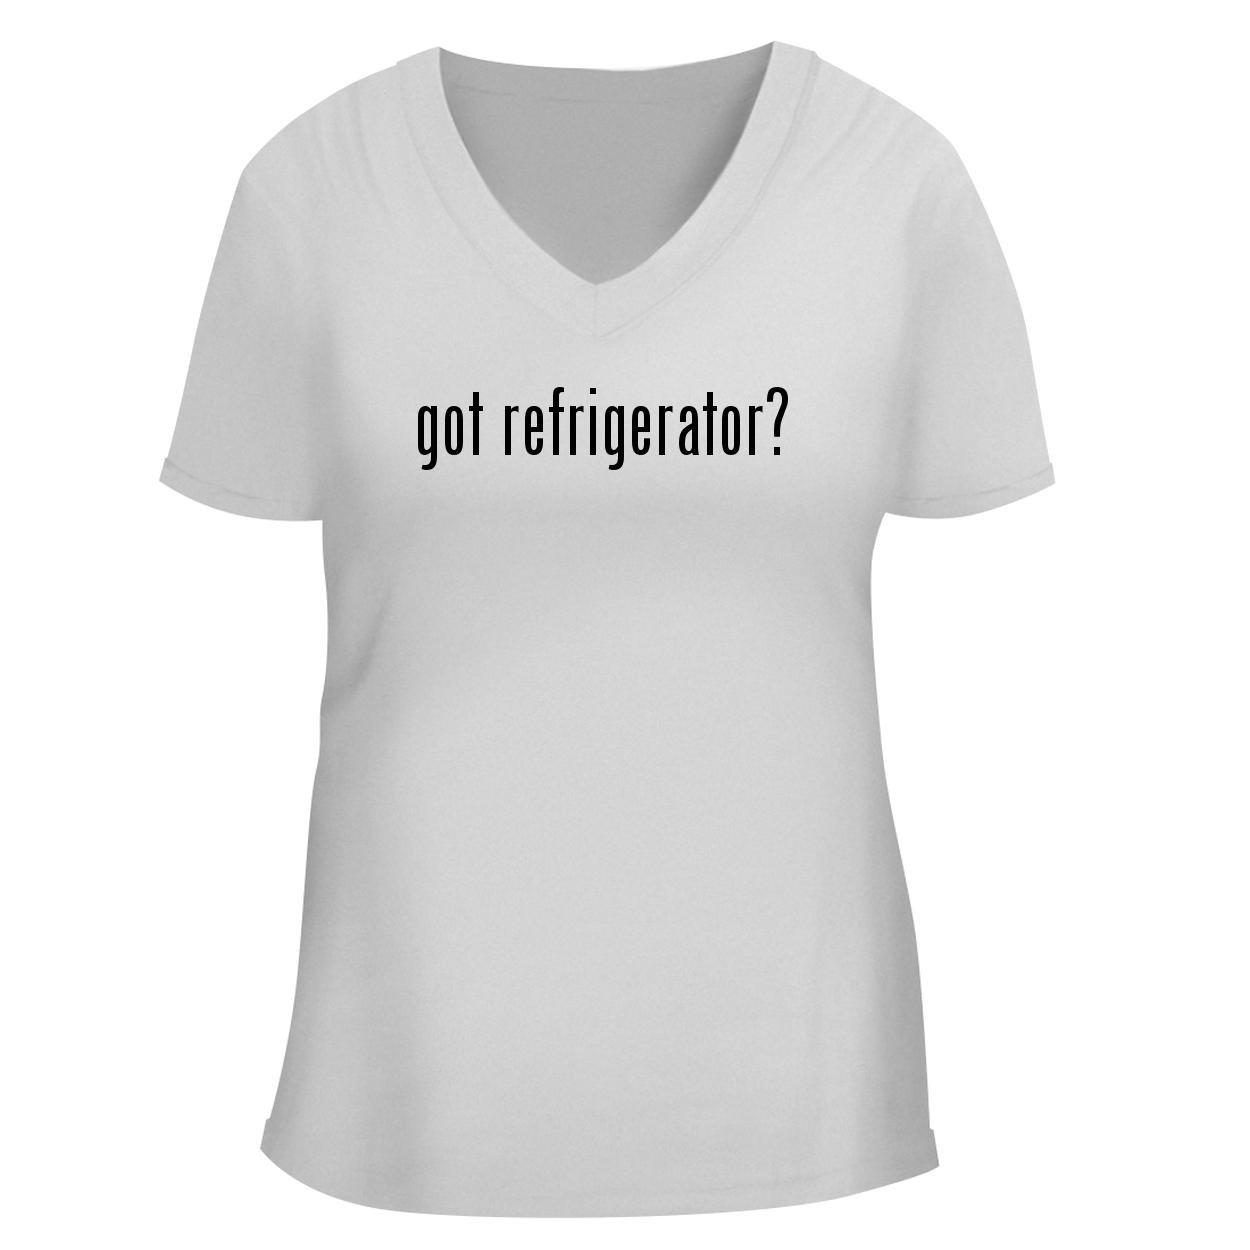 BH Cool Designs got Refrigerator? - Cute Women